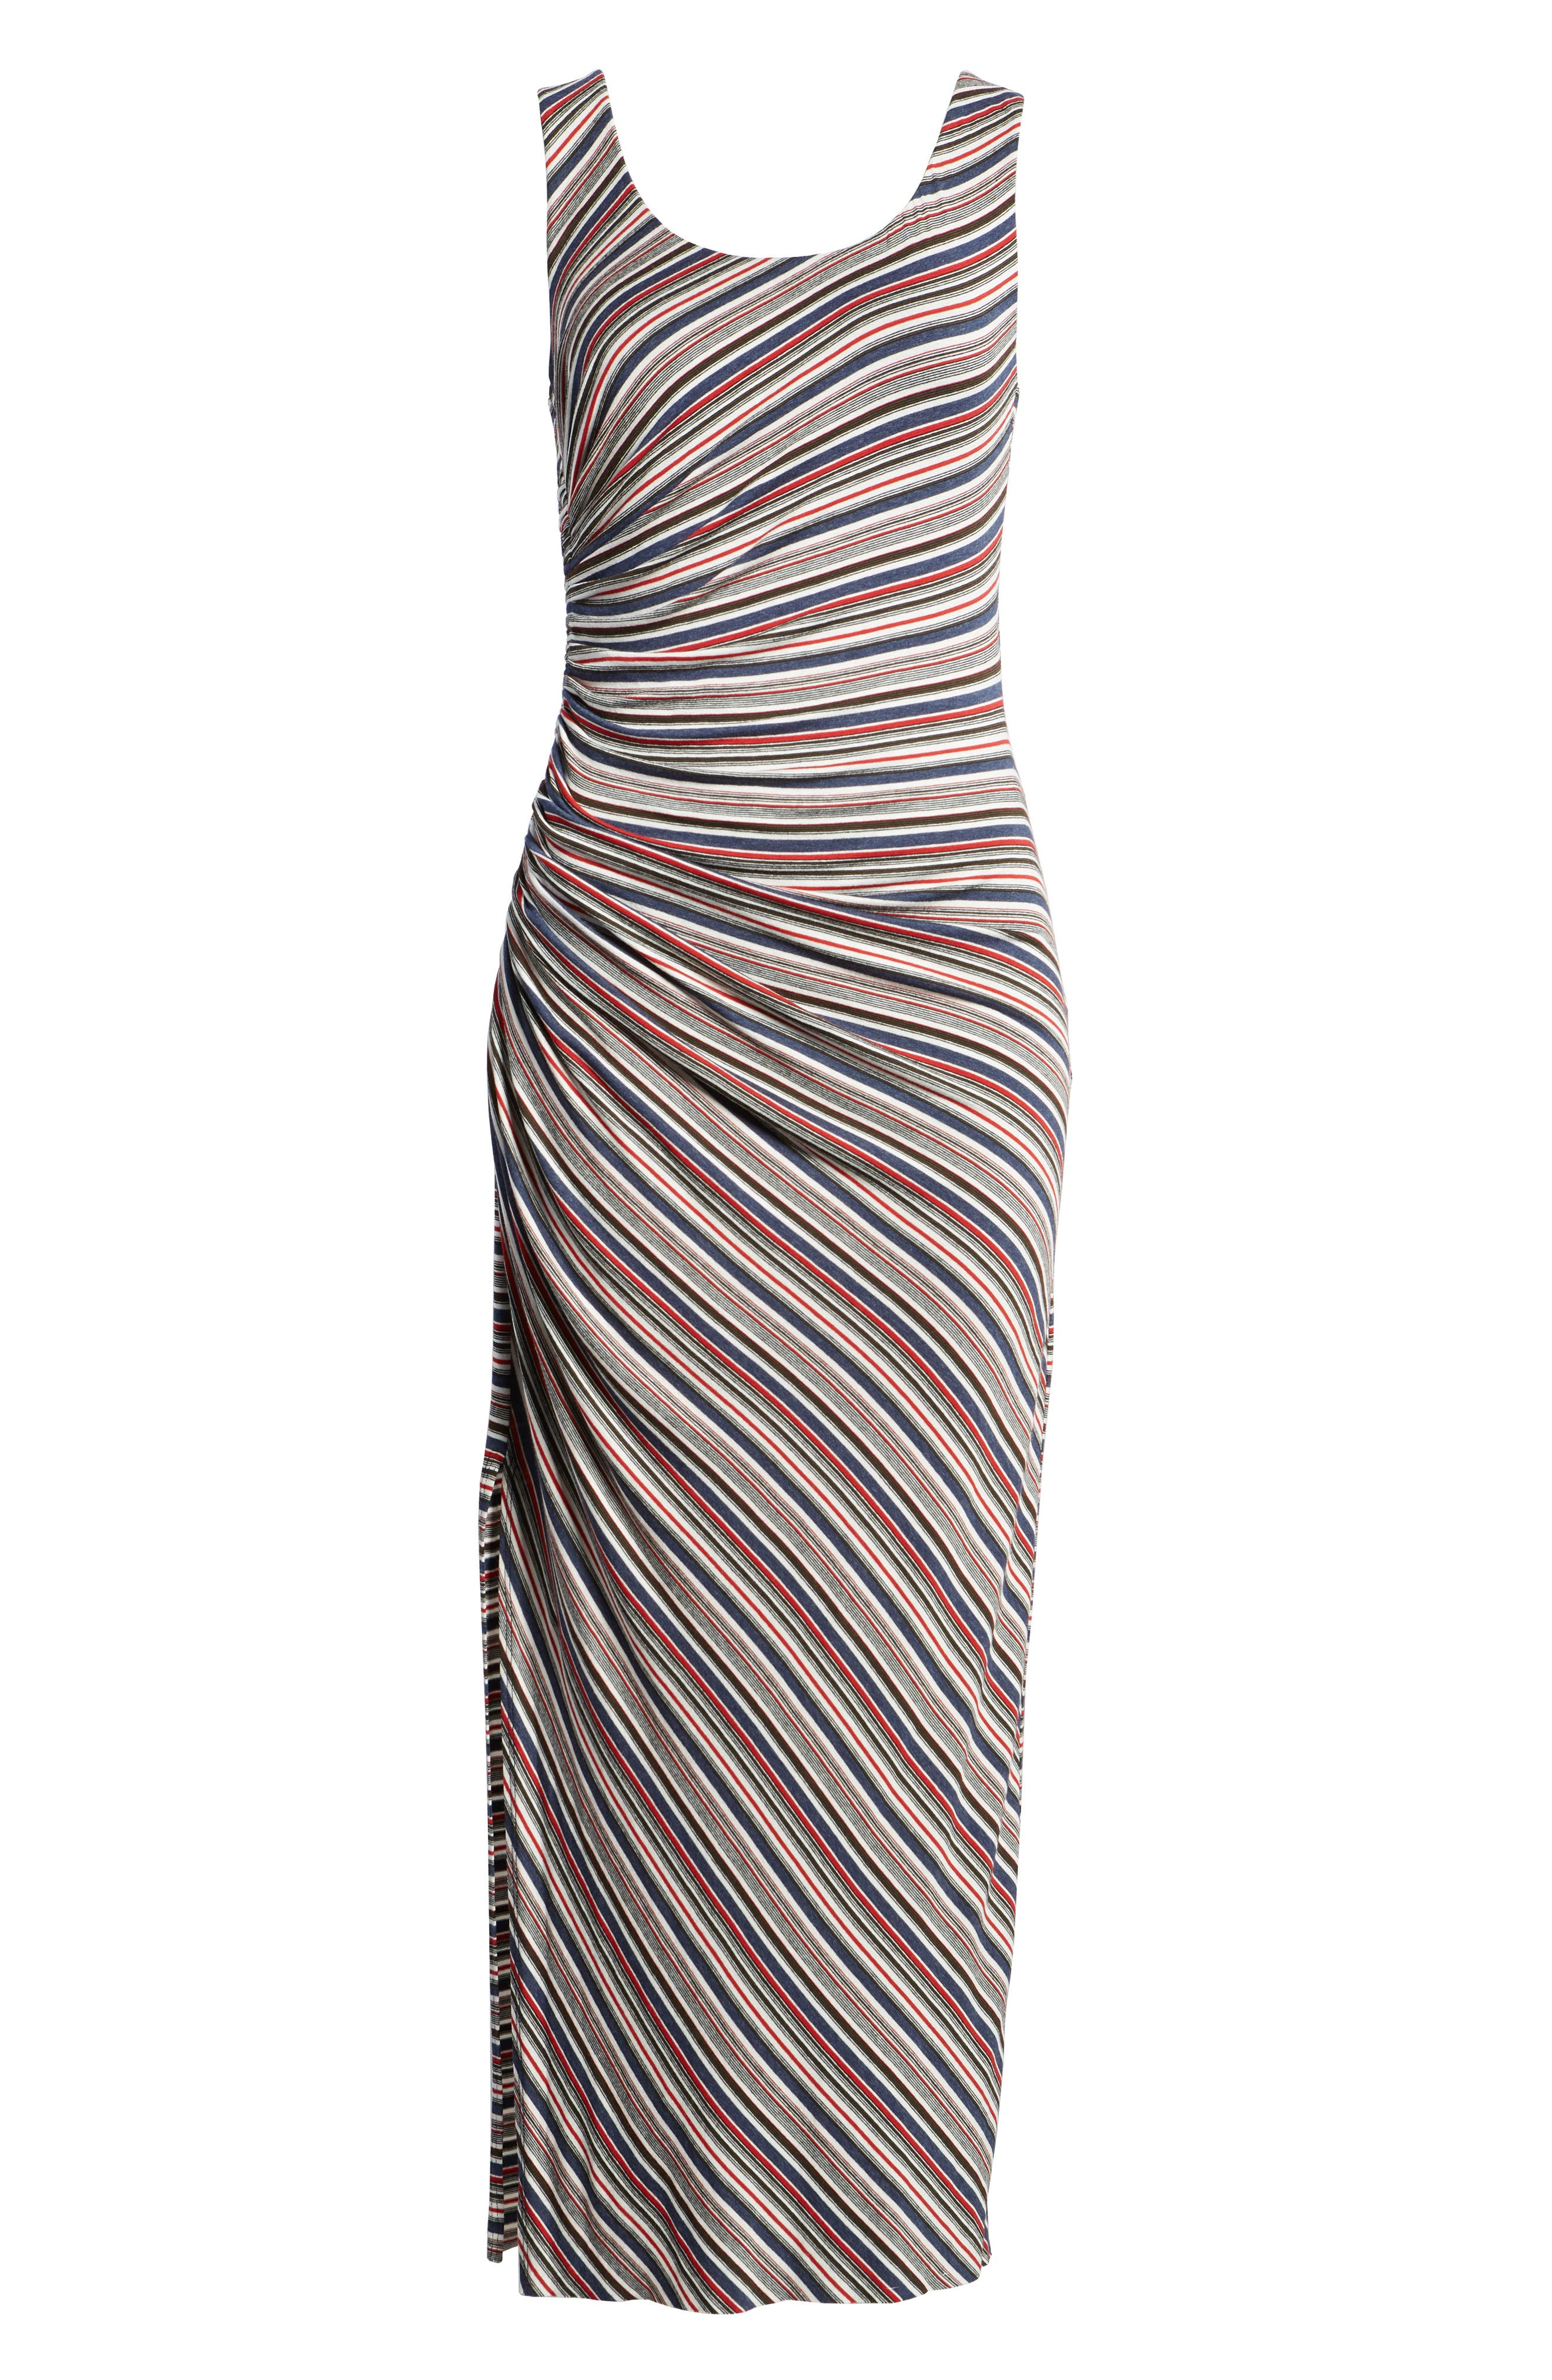 Duststorm Stripe Maxi Tank Dress,                             Alternate thumbnail 7, color,                             411